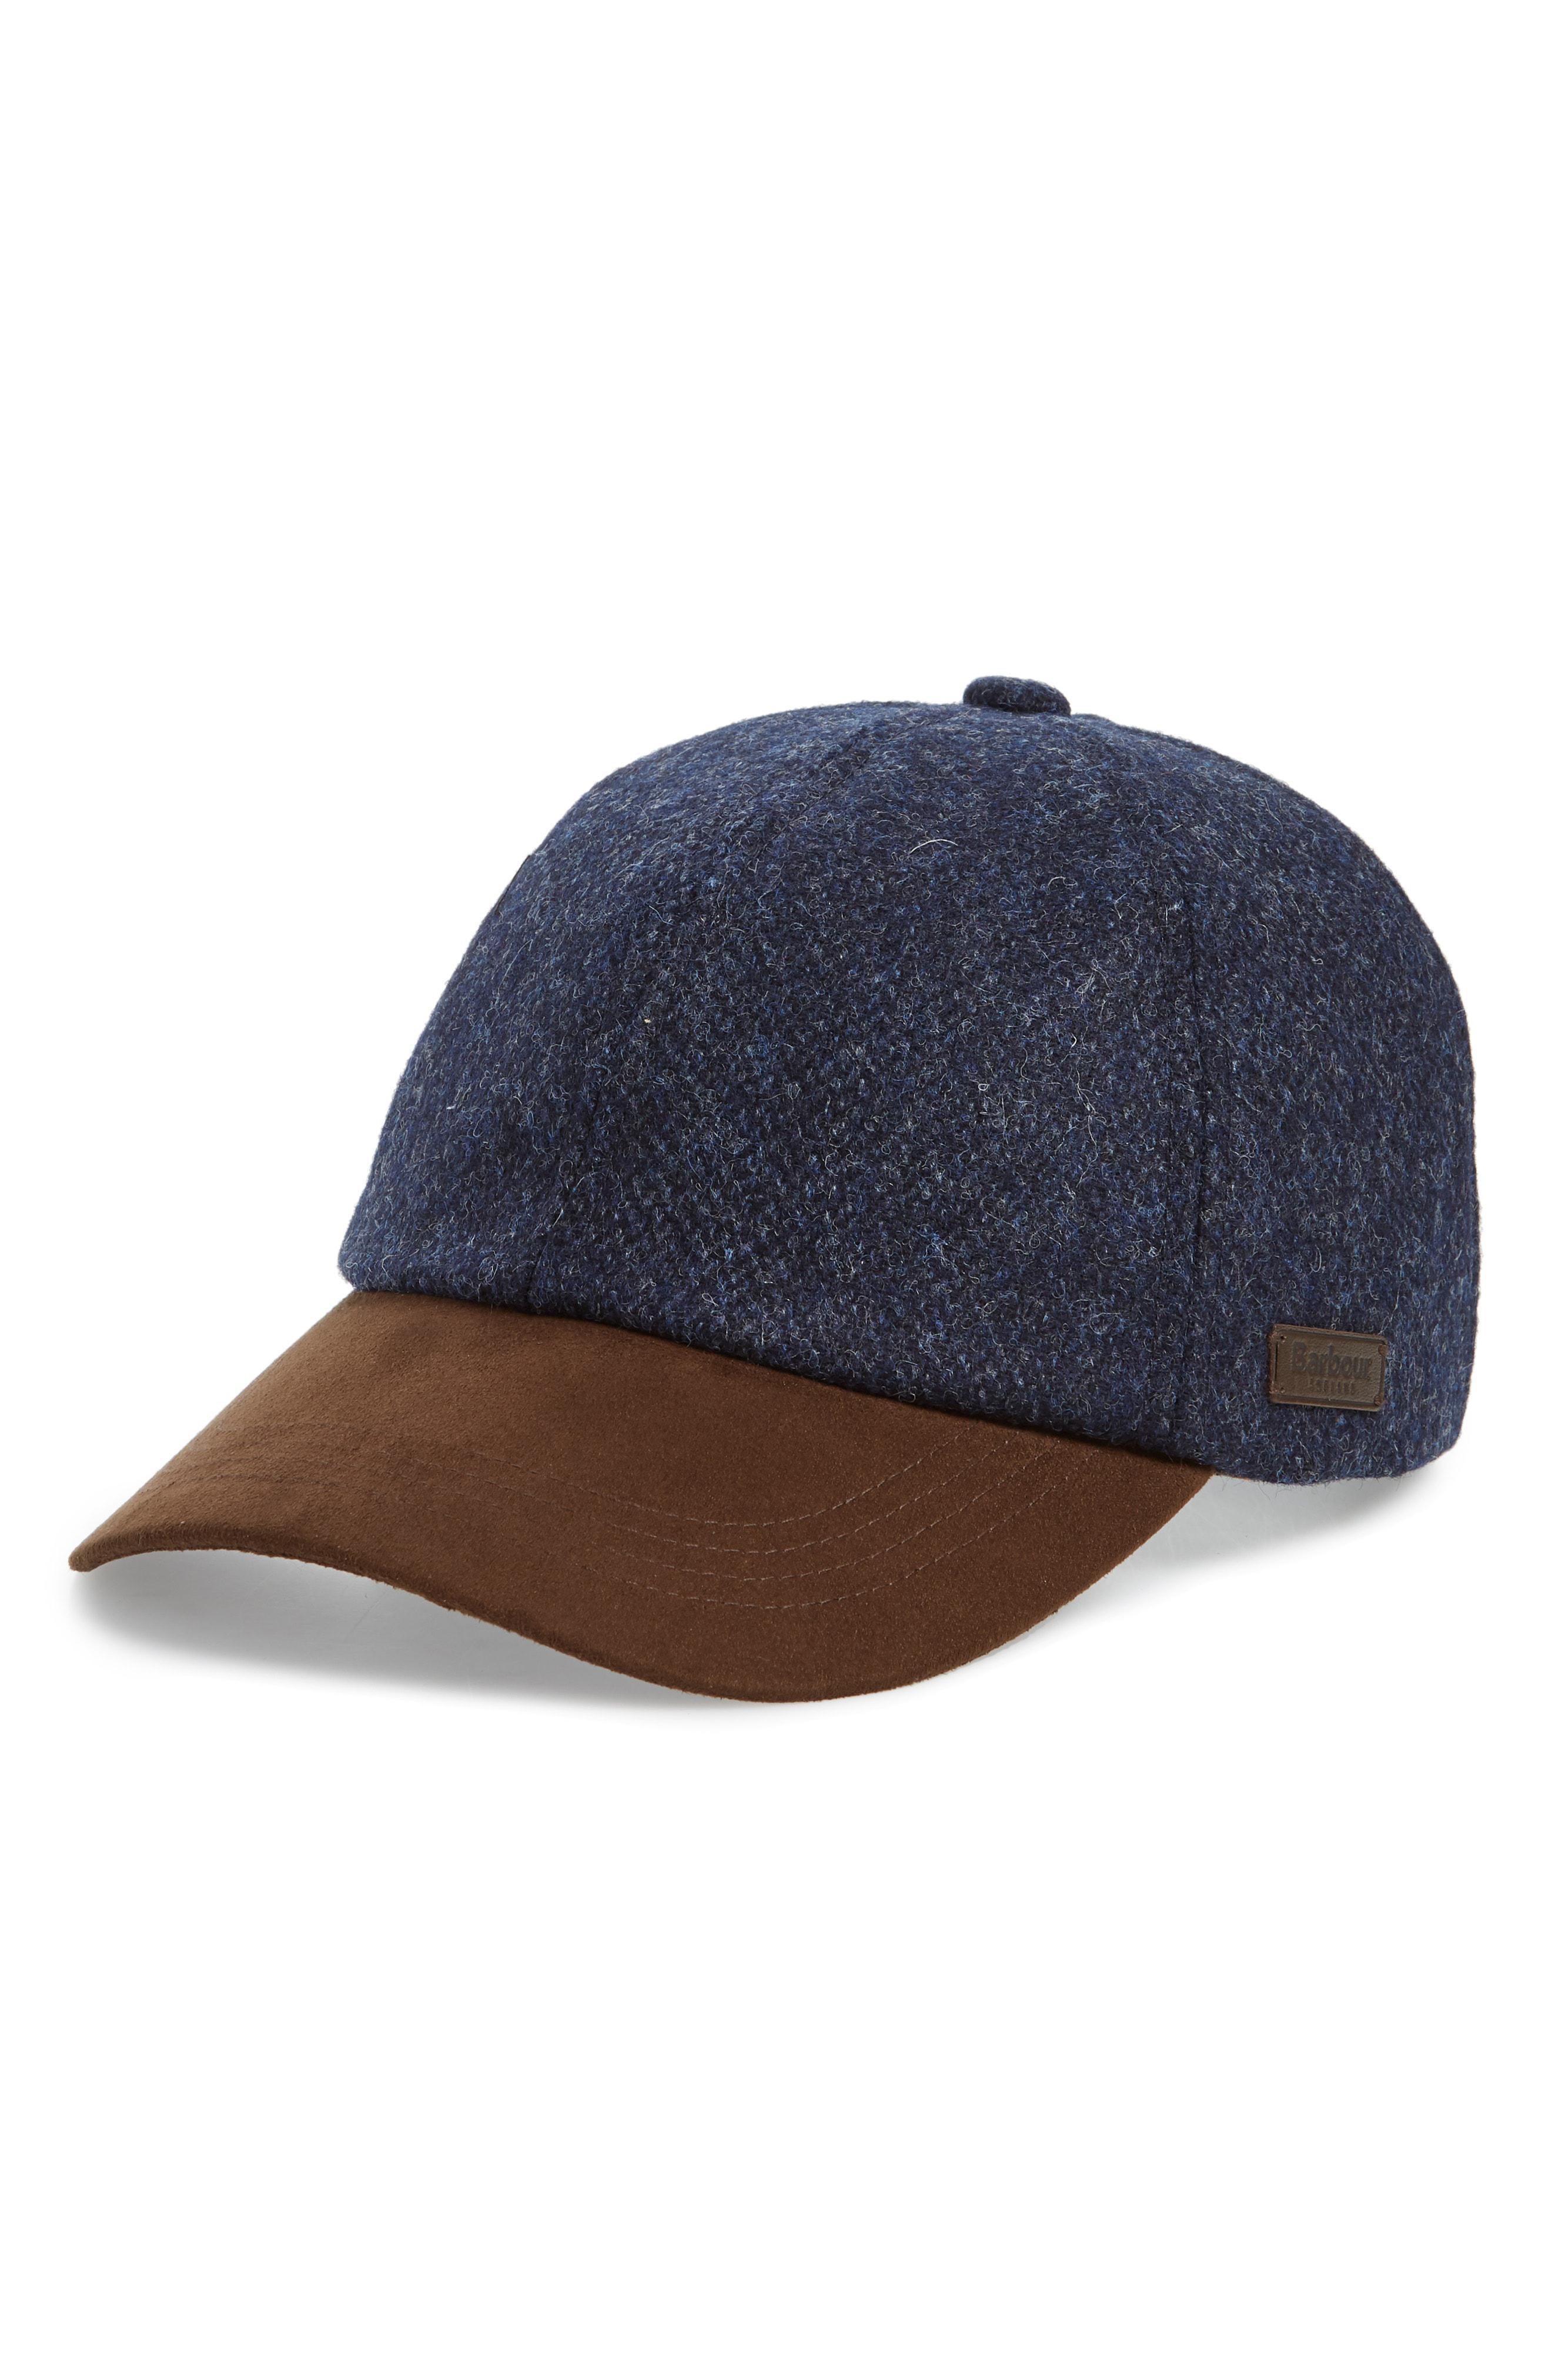 Lyst - Barbour Dotterel Wool   Moleskin Cap in Blue for Men 95d051a93a29